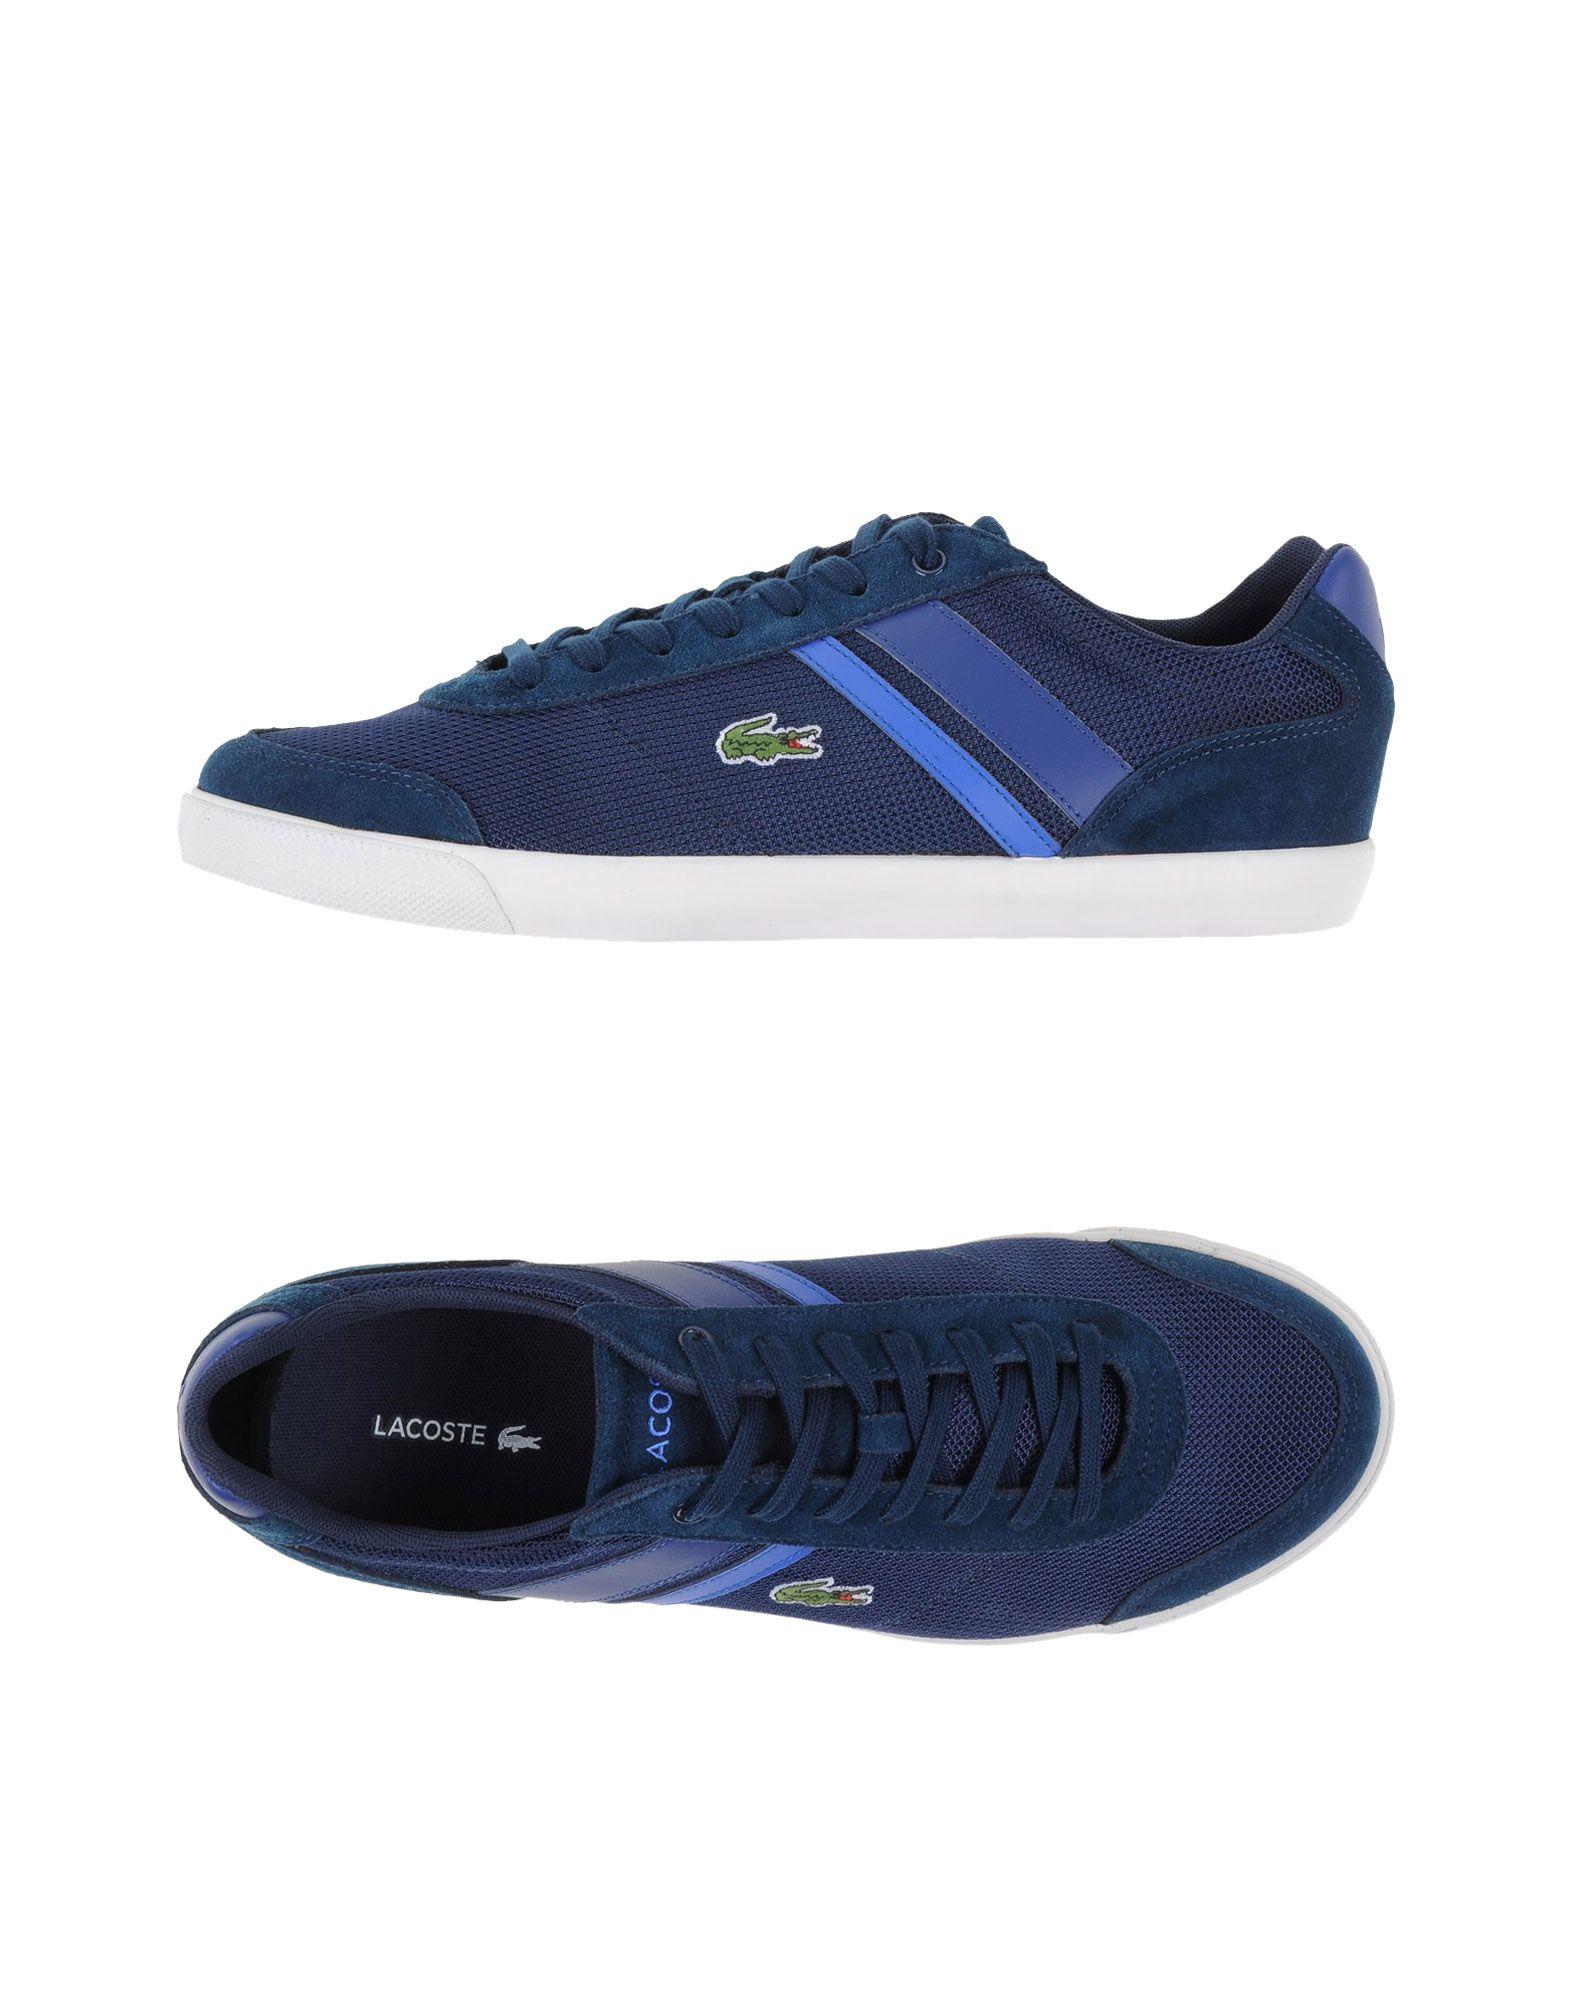 Sneakers - Lacoste Comba 116 1 - Sneakers Uomo - 11008129TA 9fc460